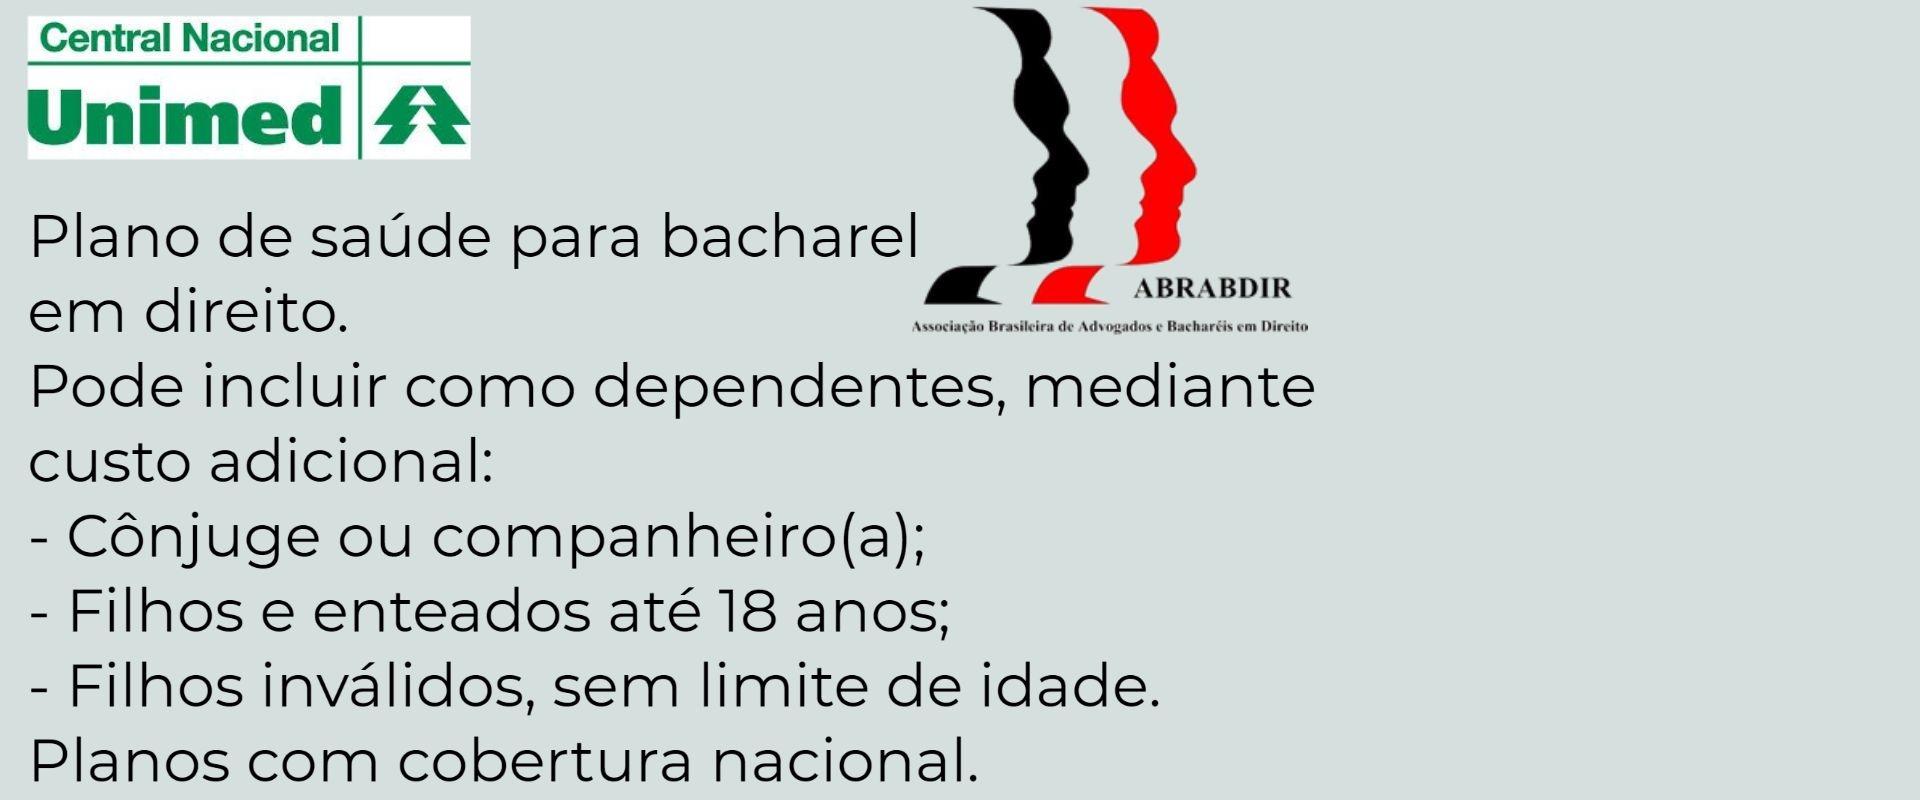 Unimed ABRABDIR Mauá